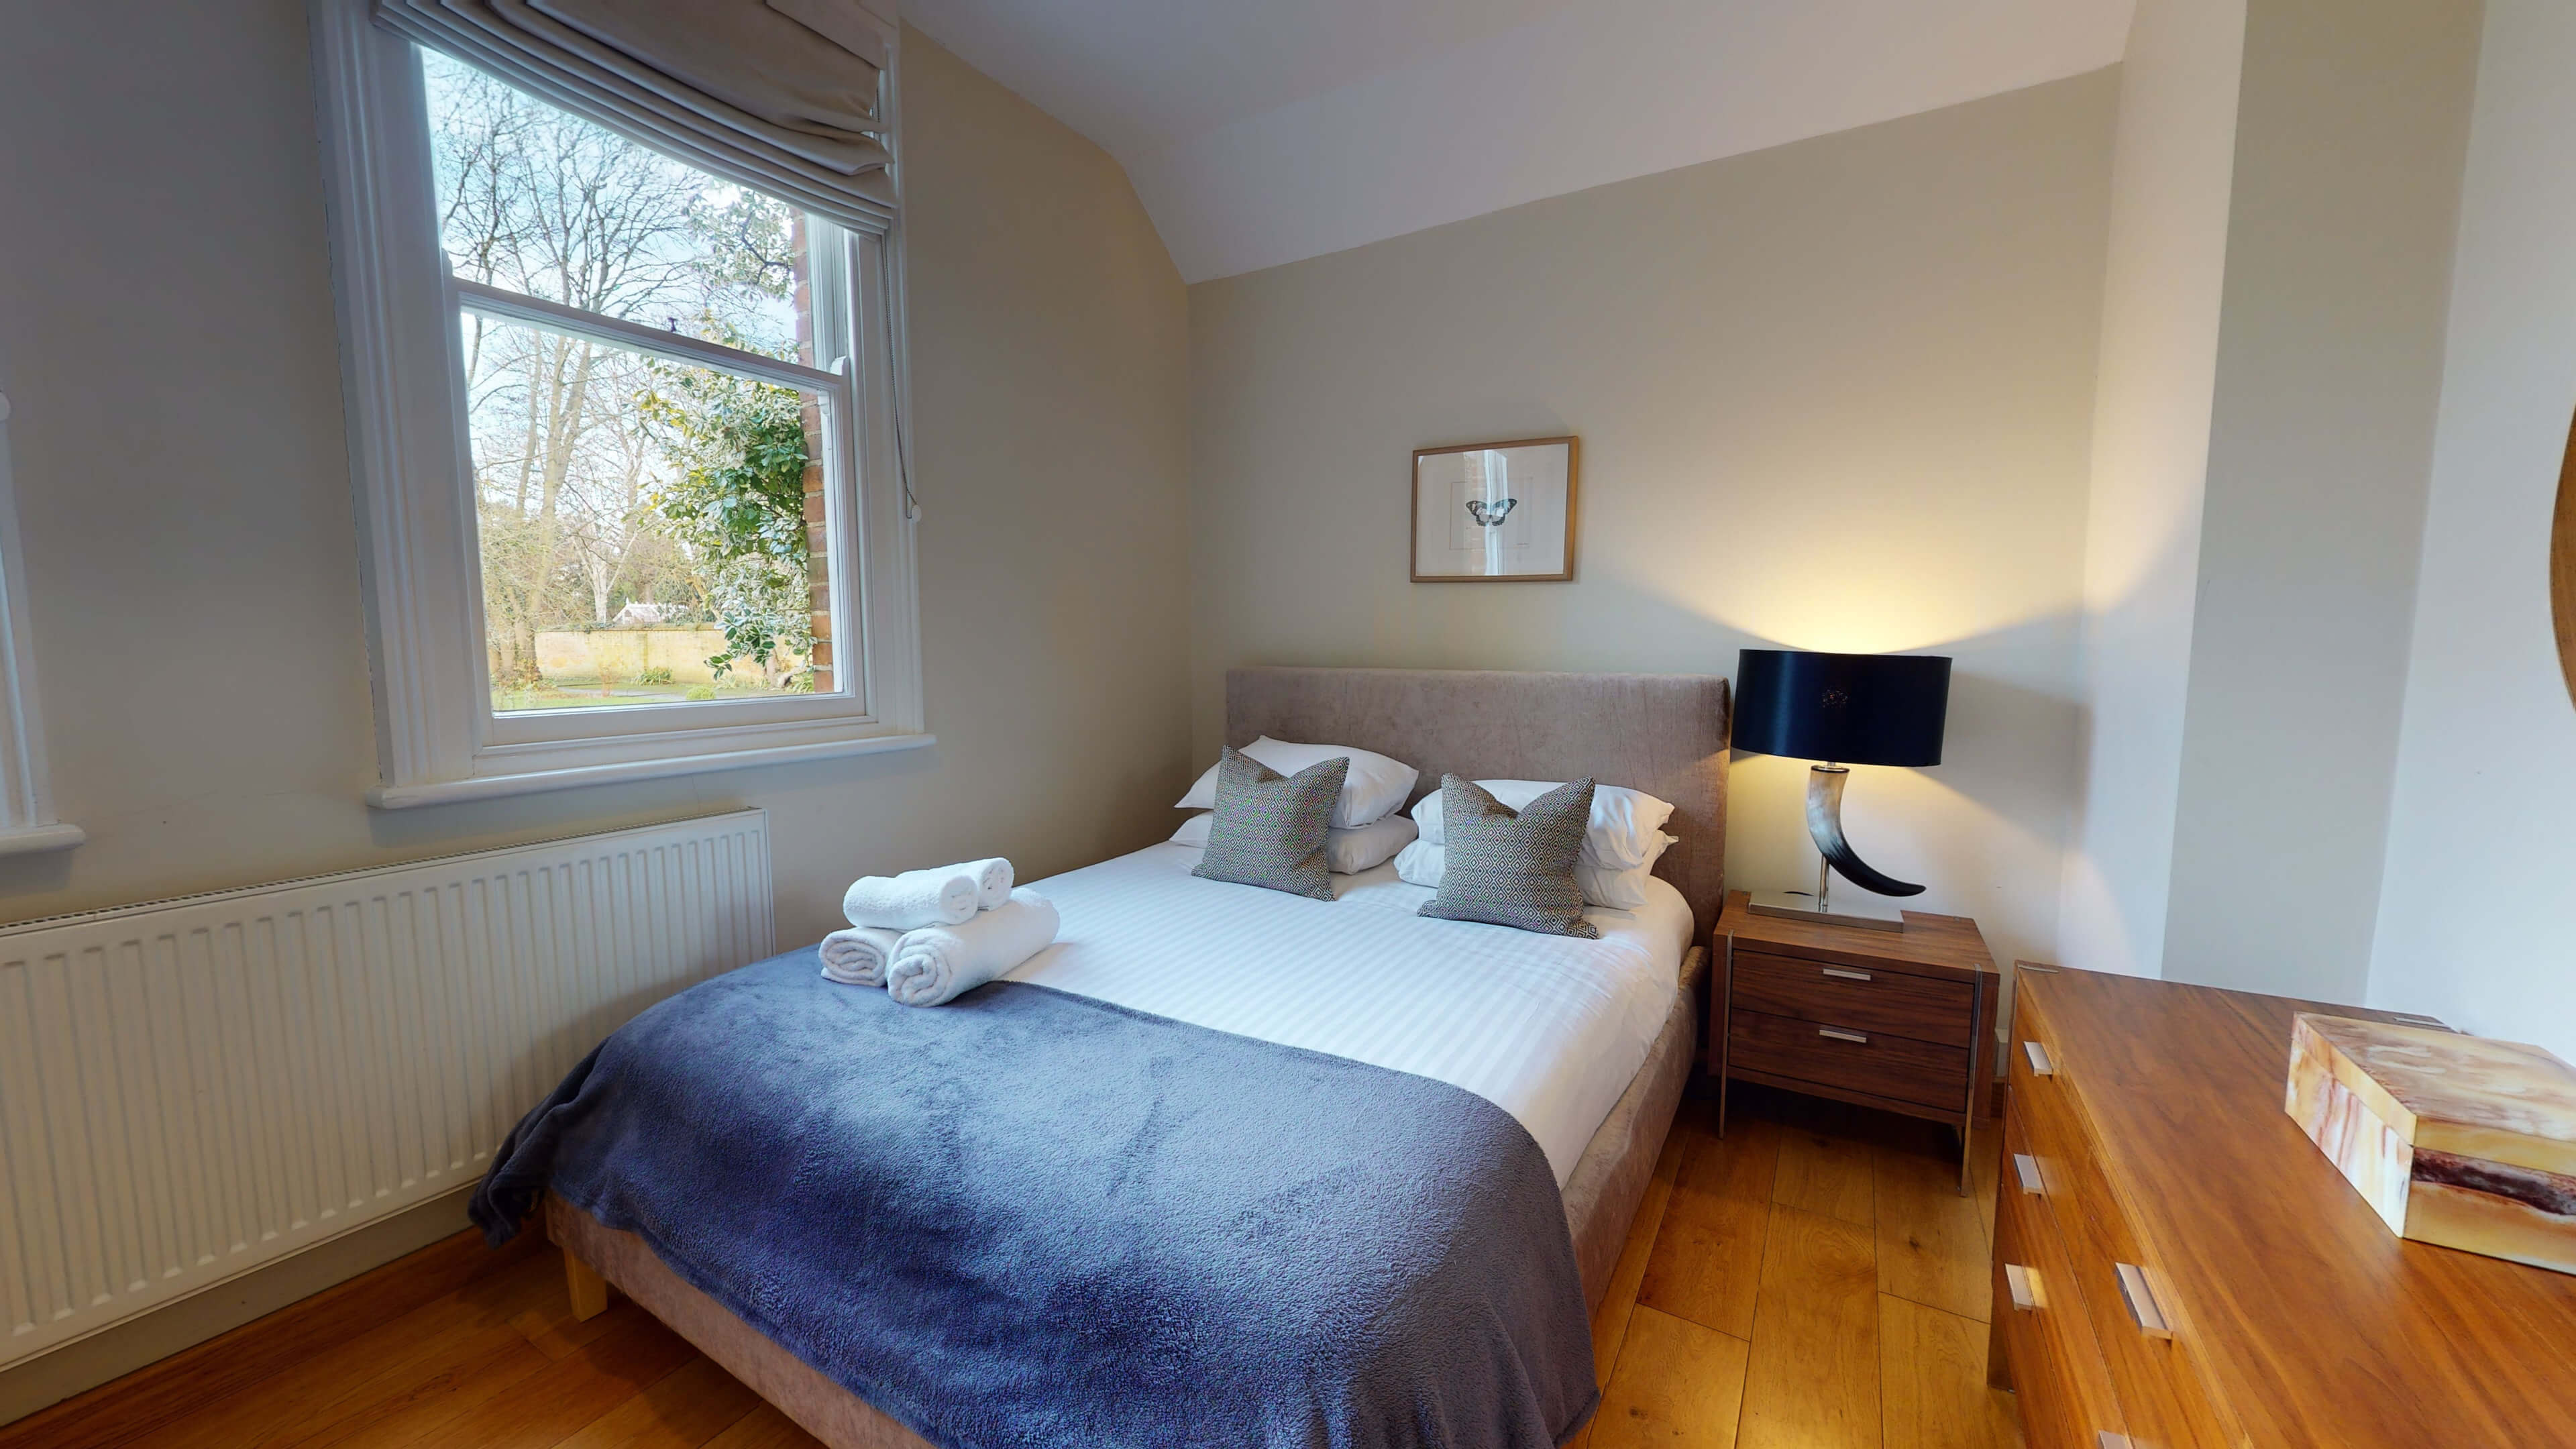 10A Rawlinson Road Rawlinson Road Bedroom 21